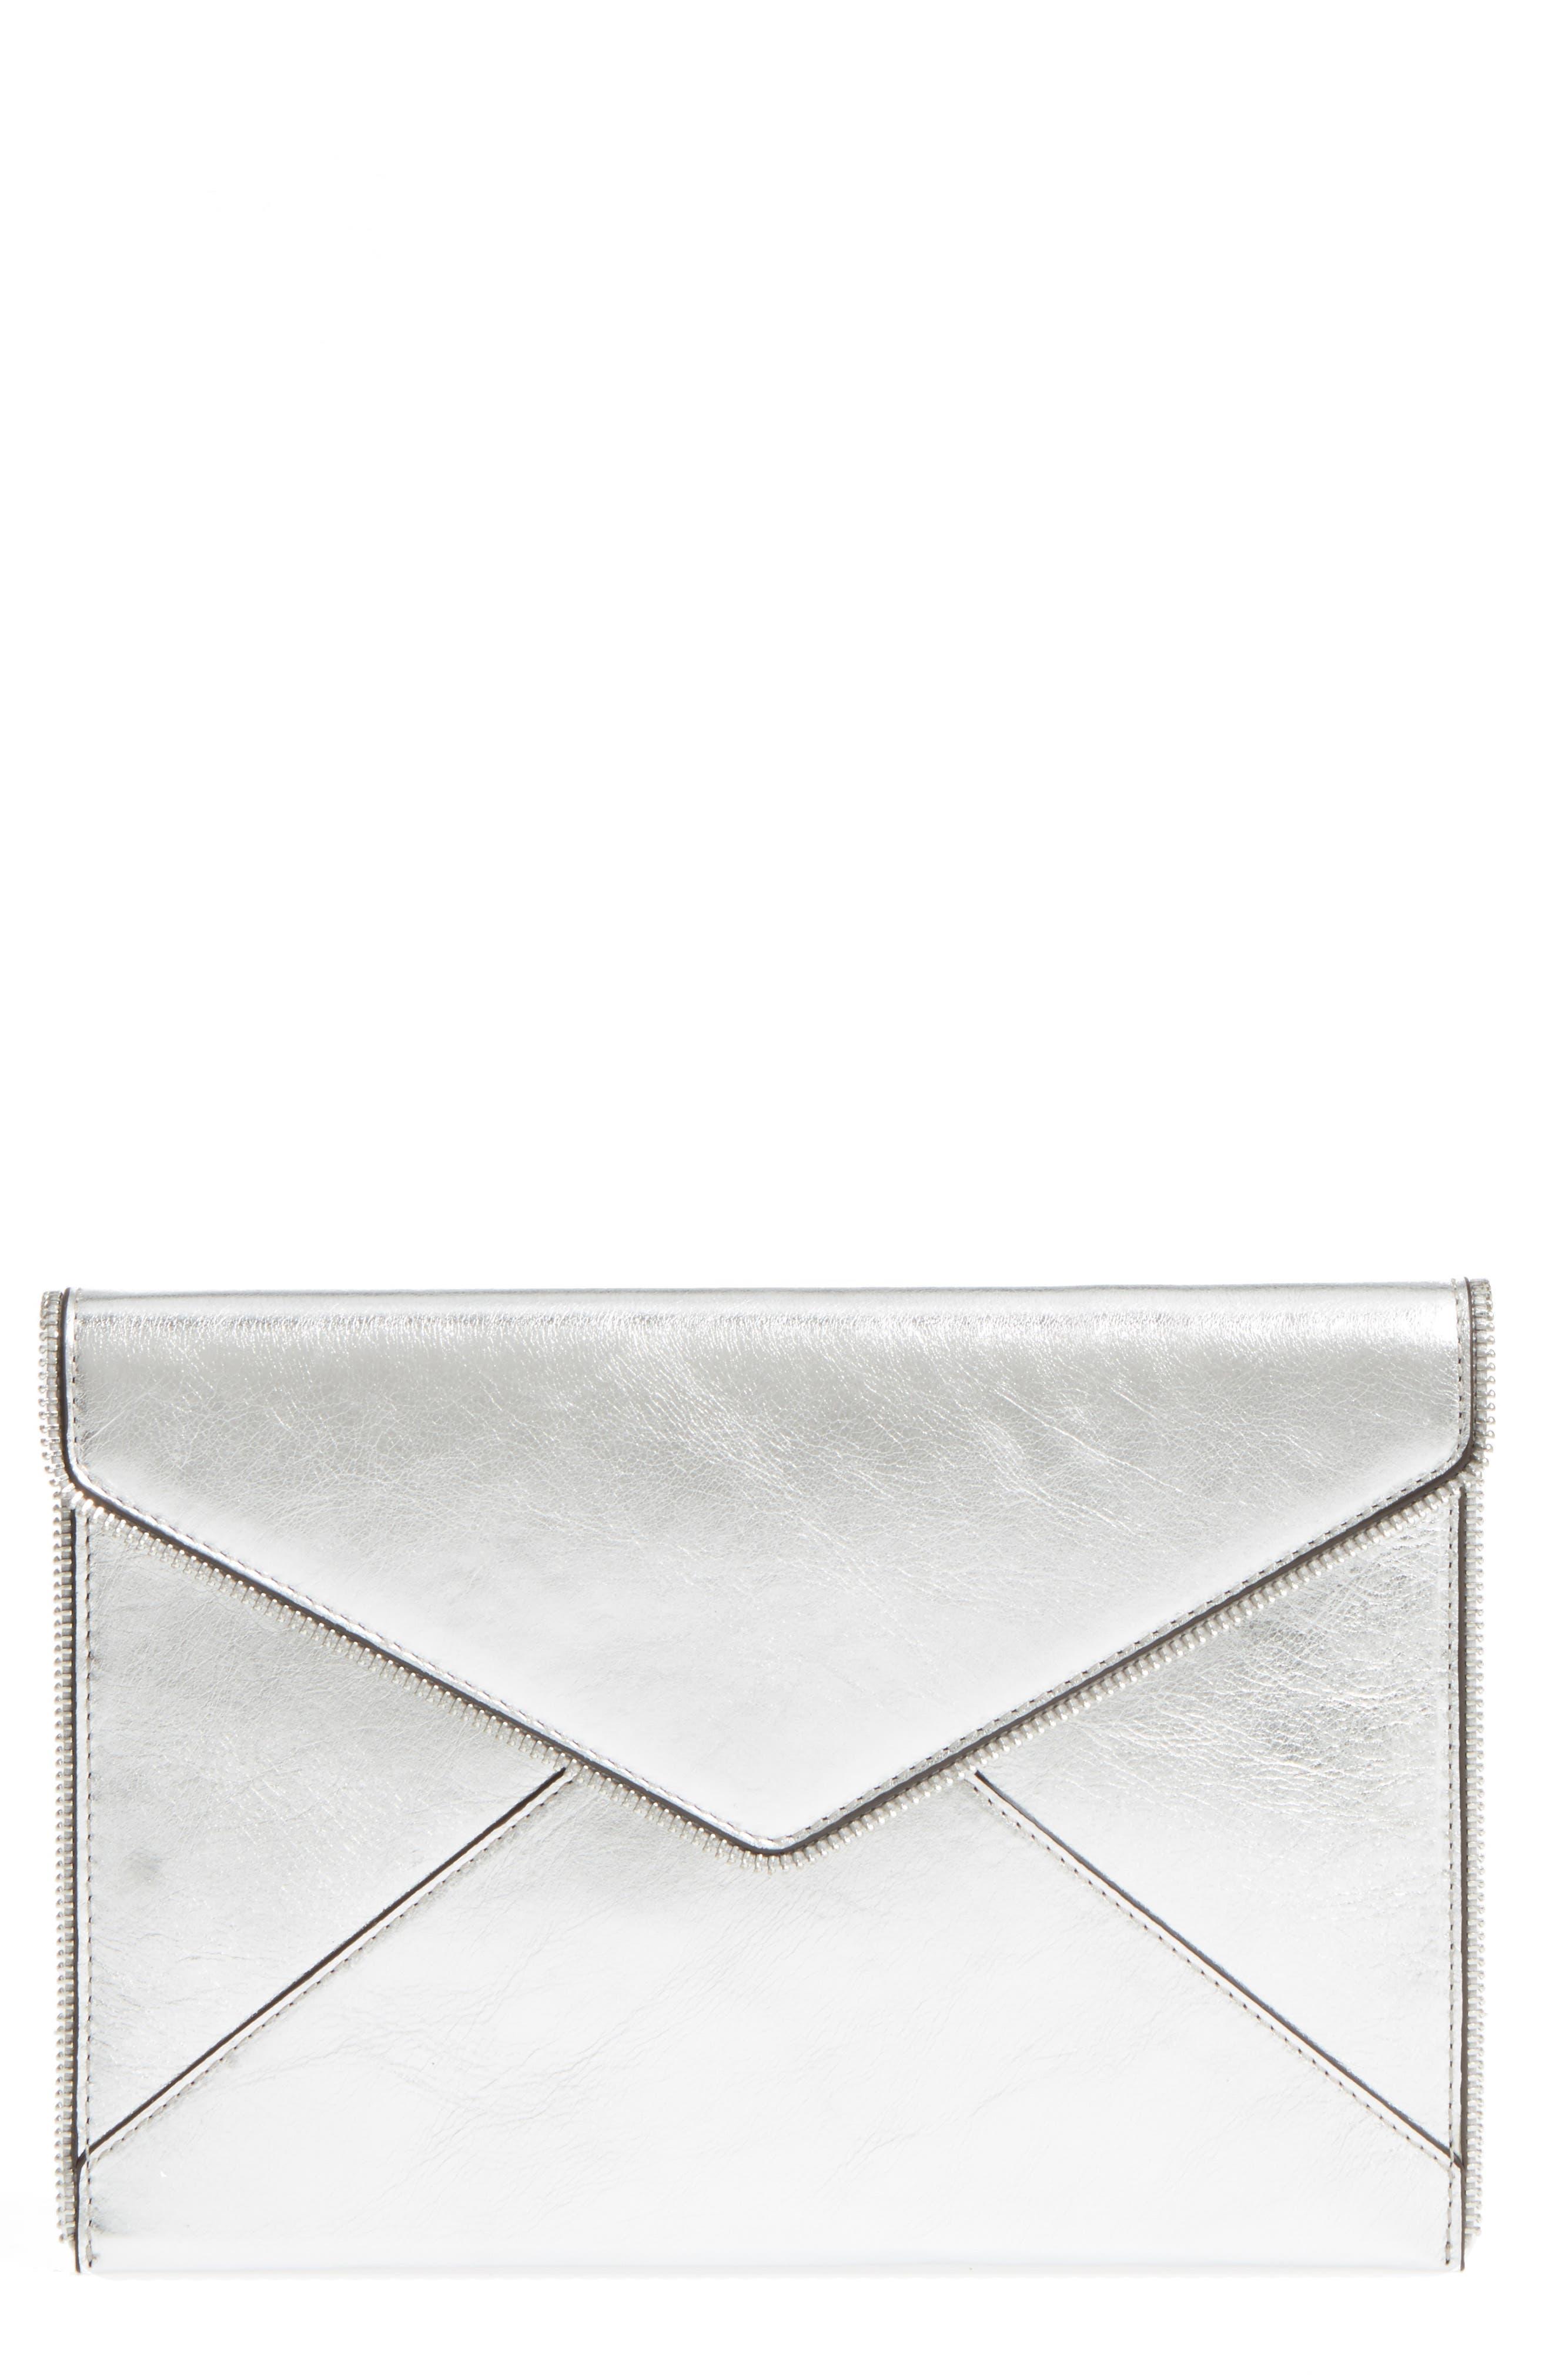 Main Image - Rebecca Minkoff Leo Mirror Metallic Envelope Clutch